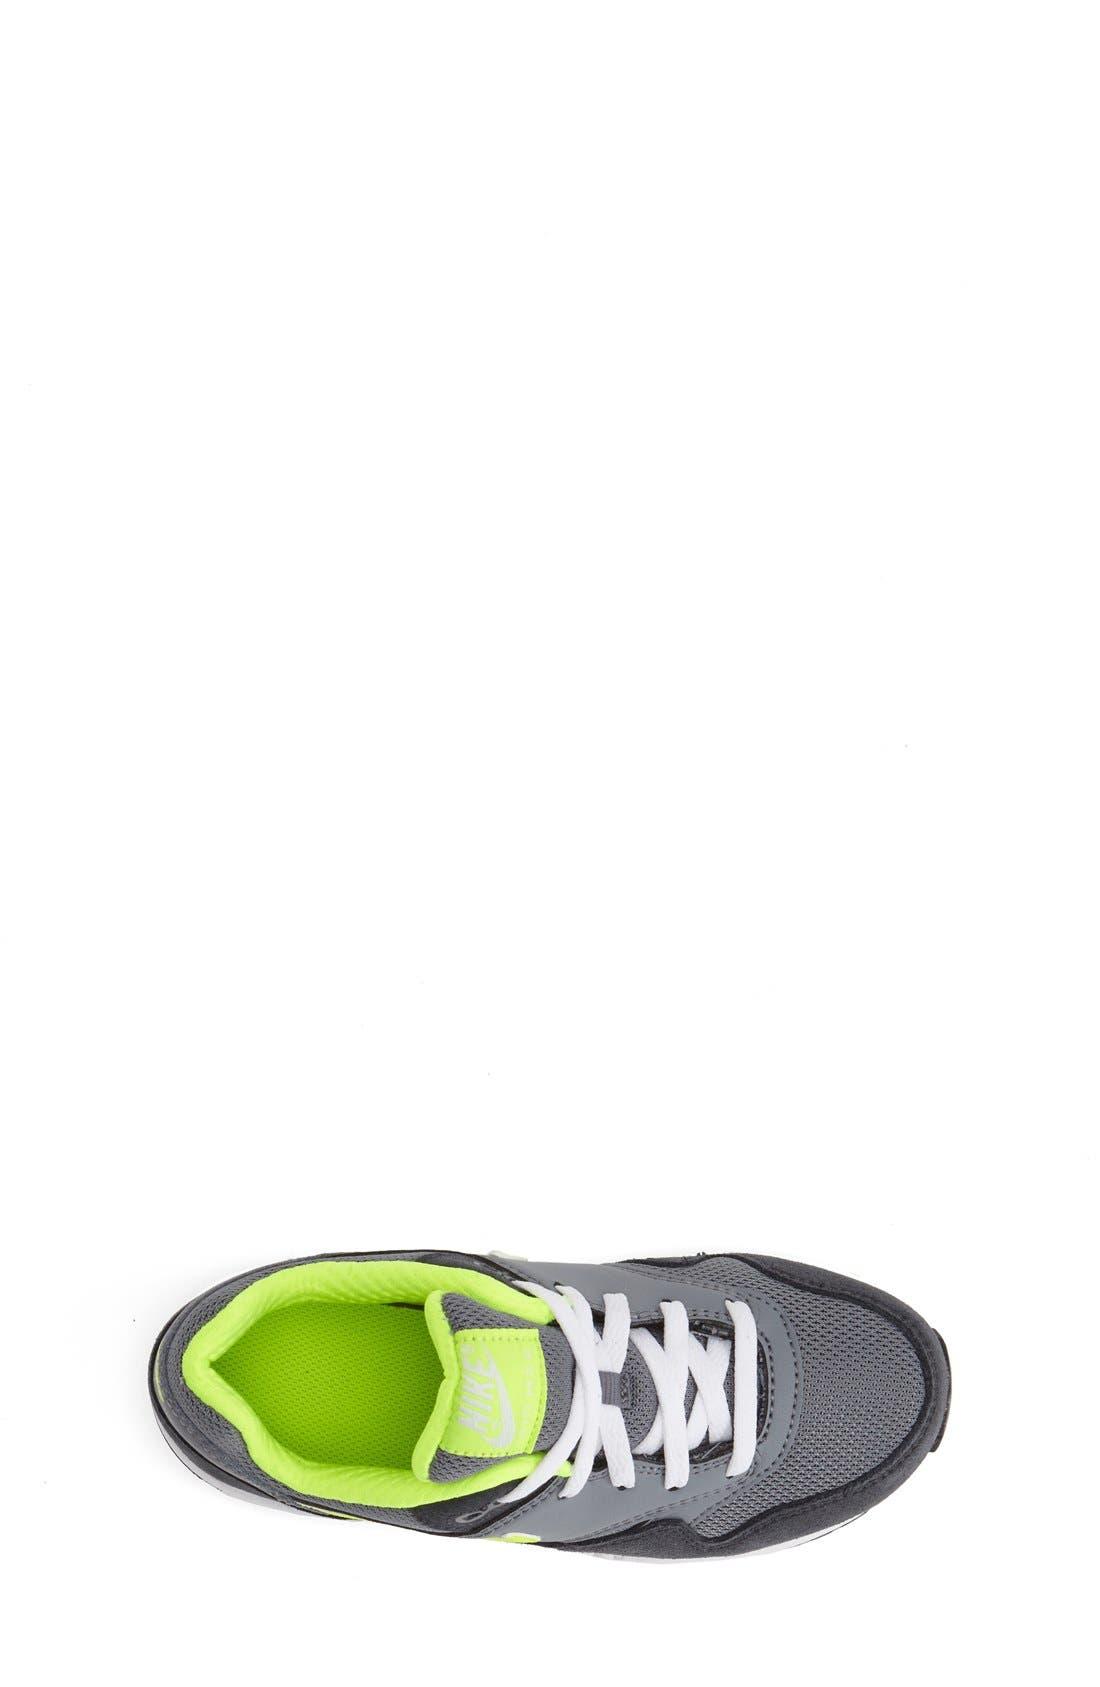 Alternate Image 3  - Nike 'Air Max 1 PS' Sneaker (Toddler & Little Kid)